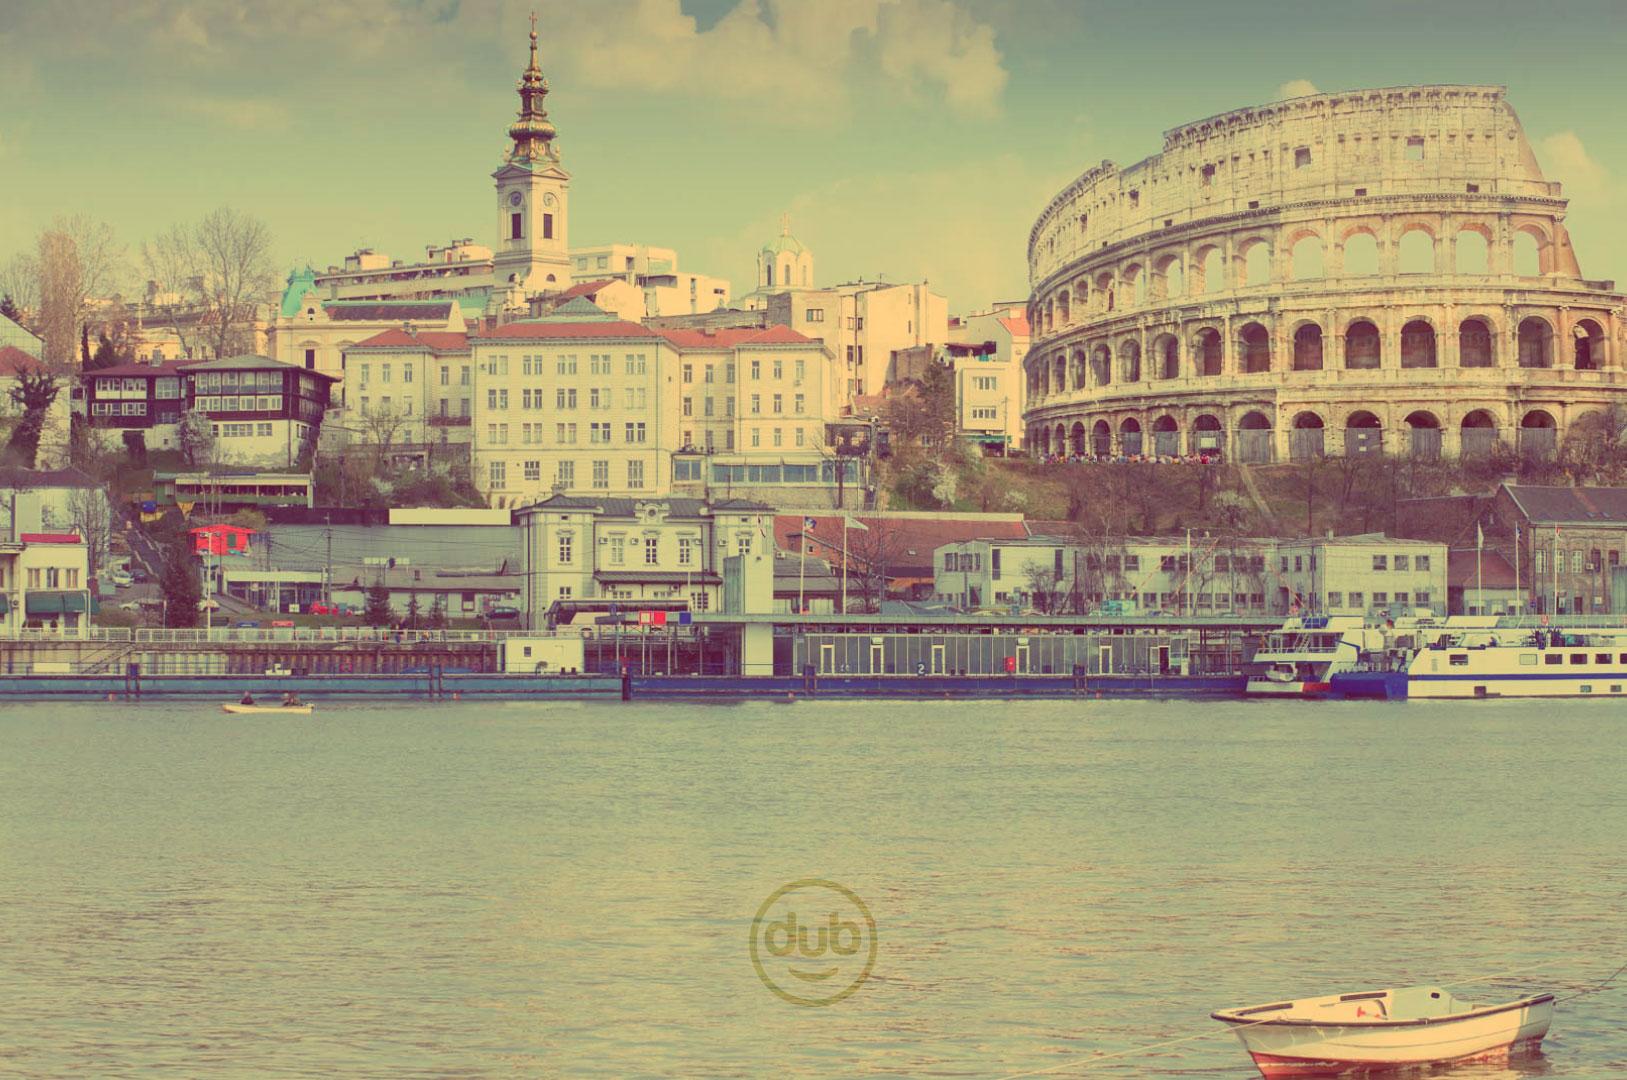 ŠBBKBB: Svetske atrakcije u Beogradu - Koloseum (foto: Shutterstock; montaža: Miloš Tripković)